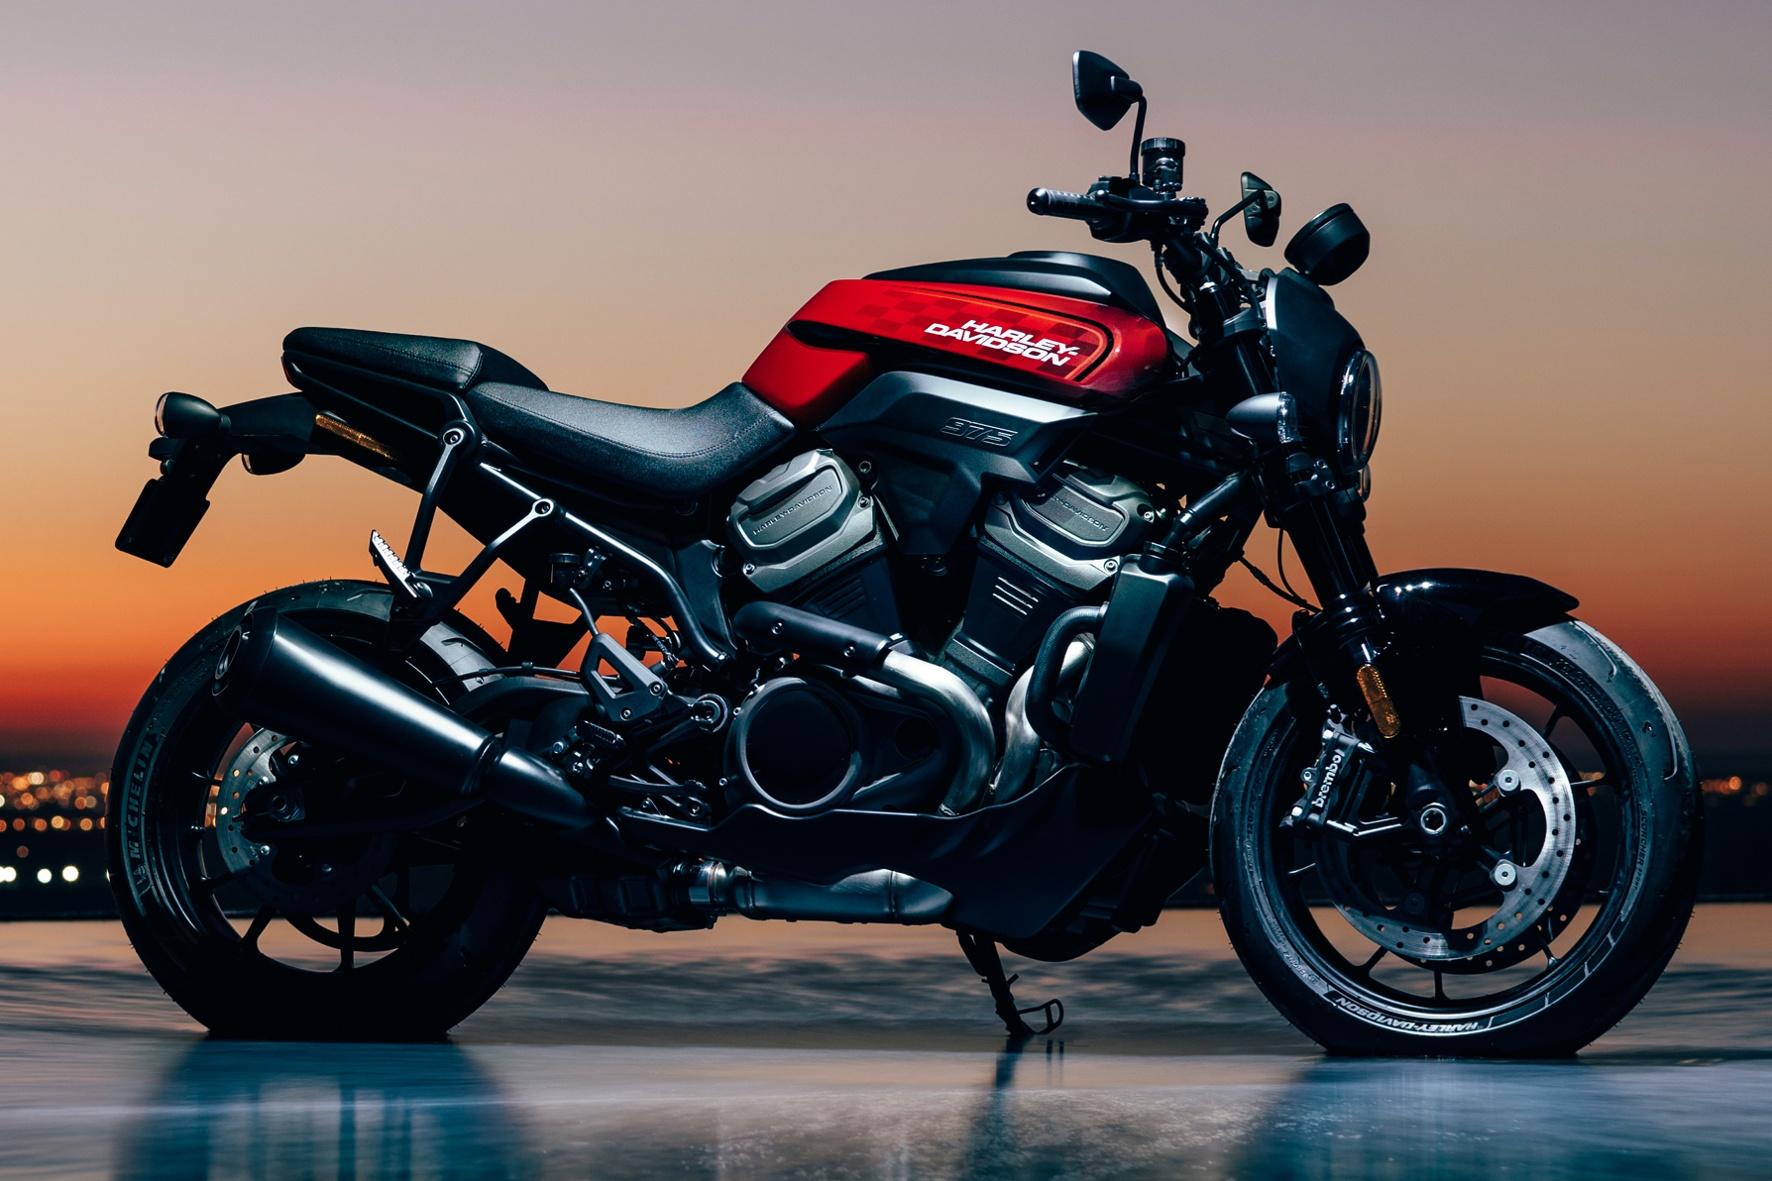 TRD-Motorrad: Mit heißem HD-Duo unterwegs in neue Märkte